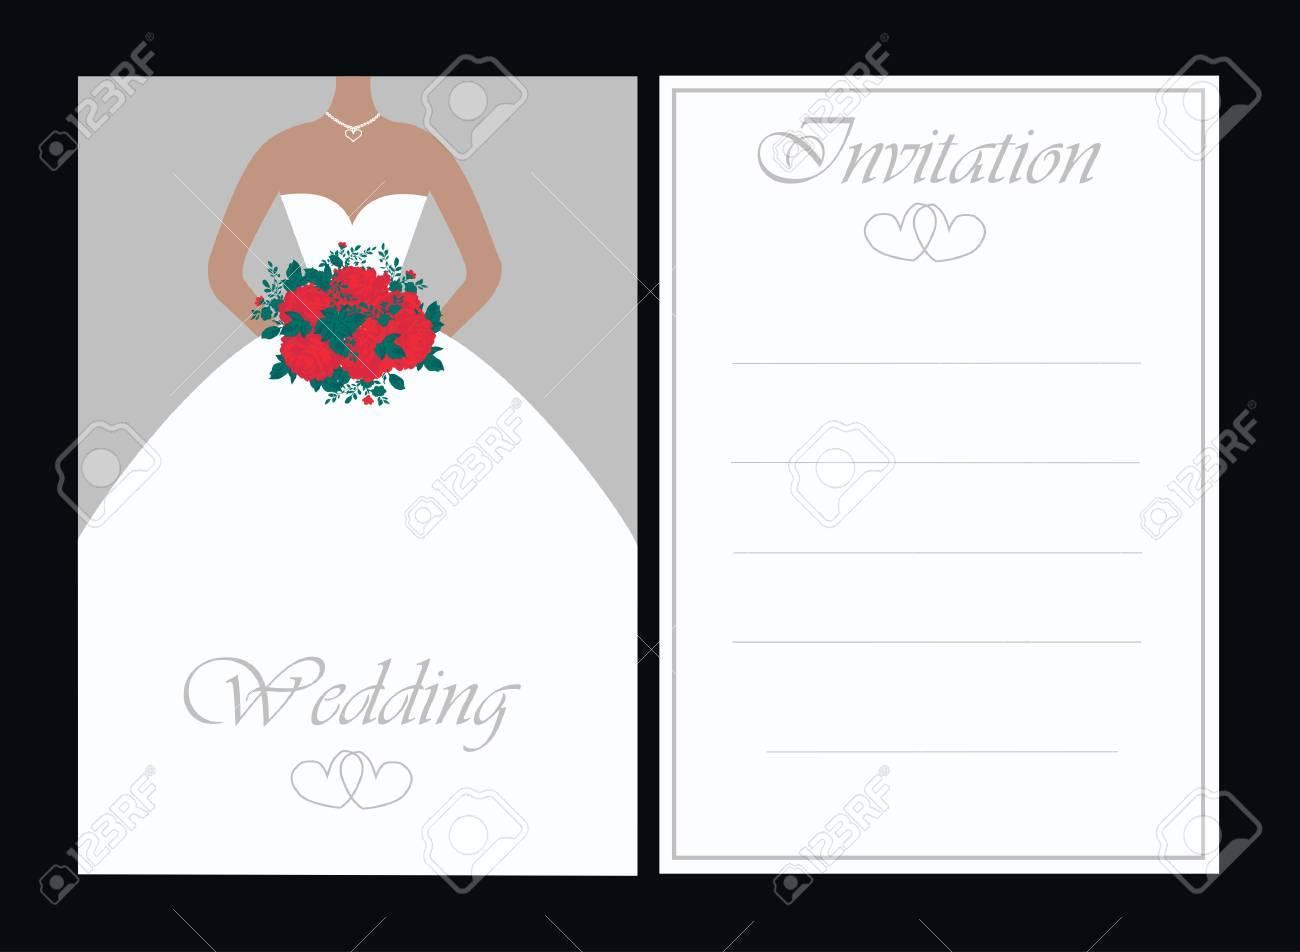 wedding invitation - 8644555